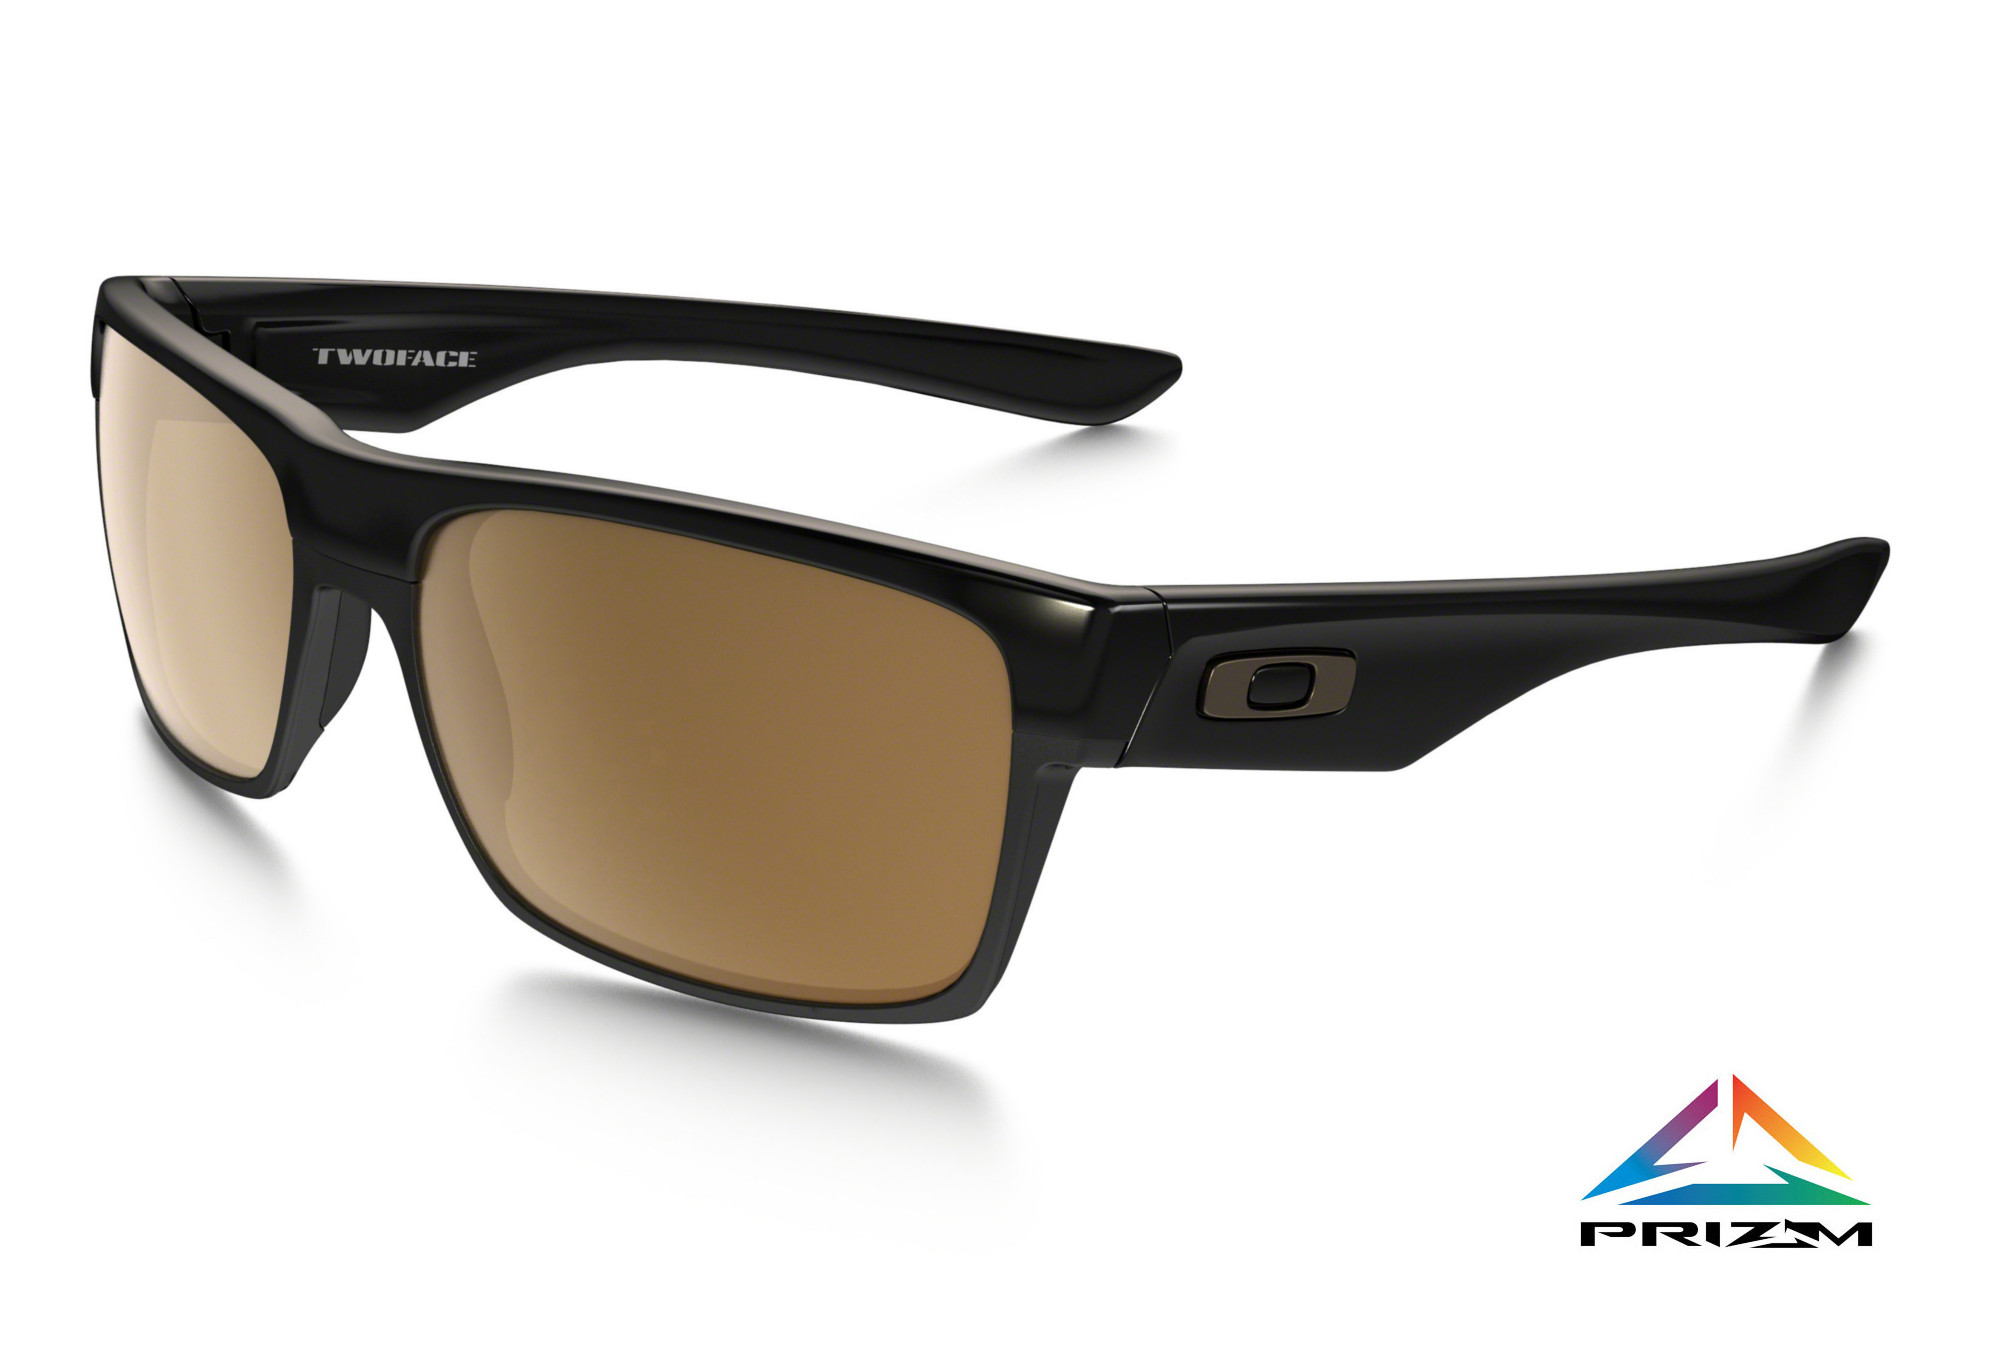 b64904bde3 Oakley TwoFace Sunglasses Black - Bronze Iridium Ref OO9189-03 ...